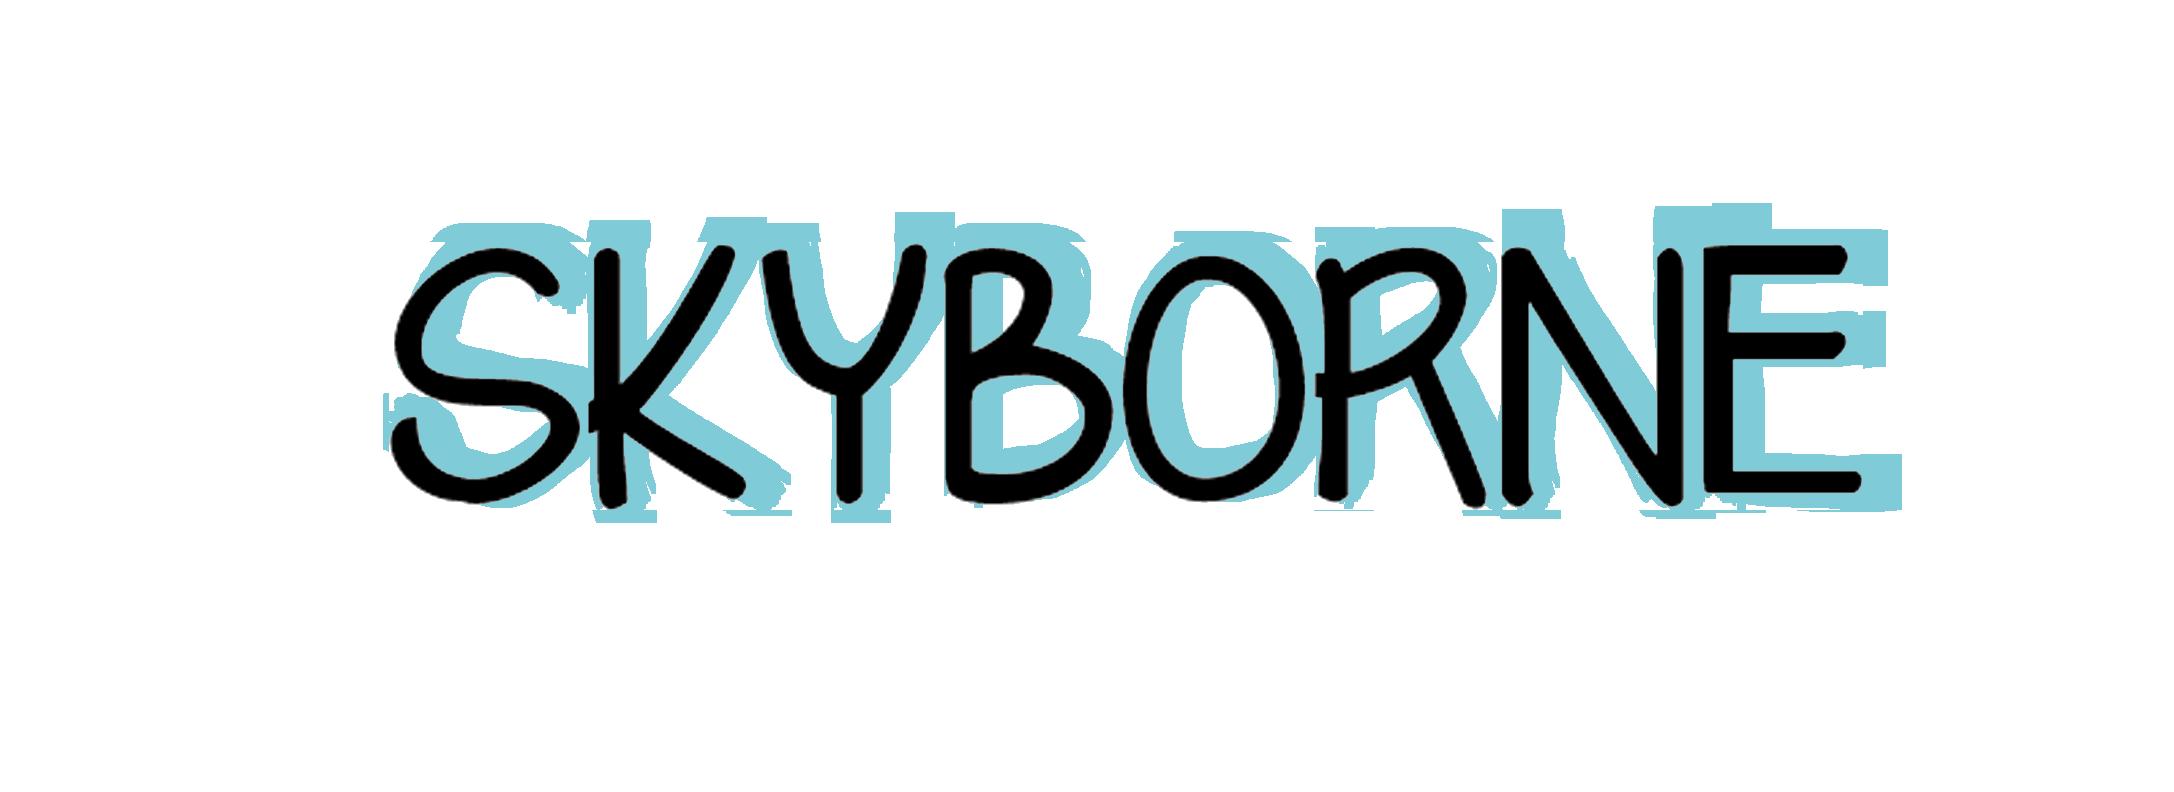 Skyborne